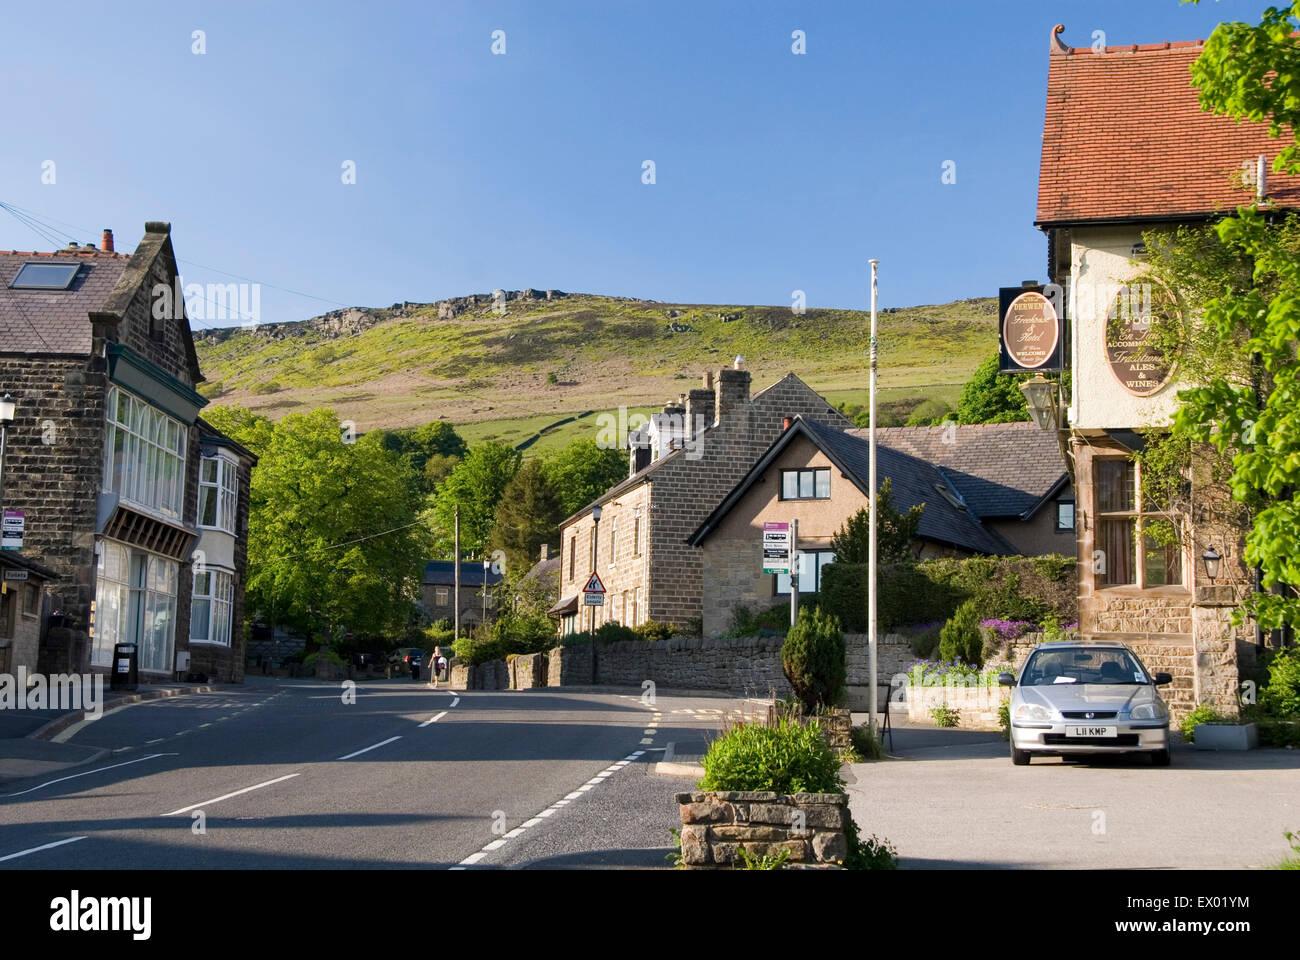 BAMFORD, Derbyshire, UK - June 04: The Derwent Hotel in Bamford nestled beneath Stanage Edge, Peak District on 04 - Stock Image